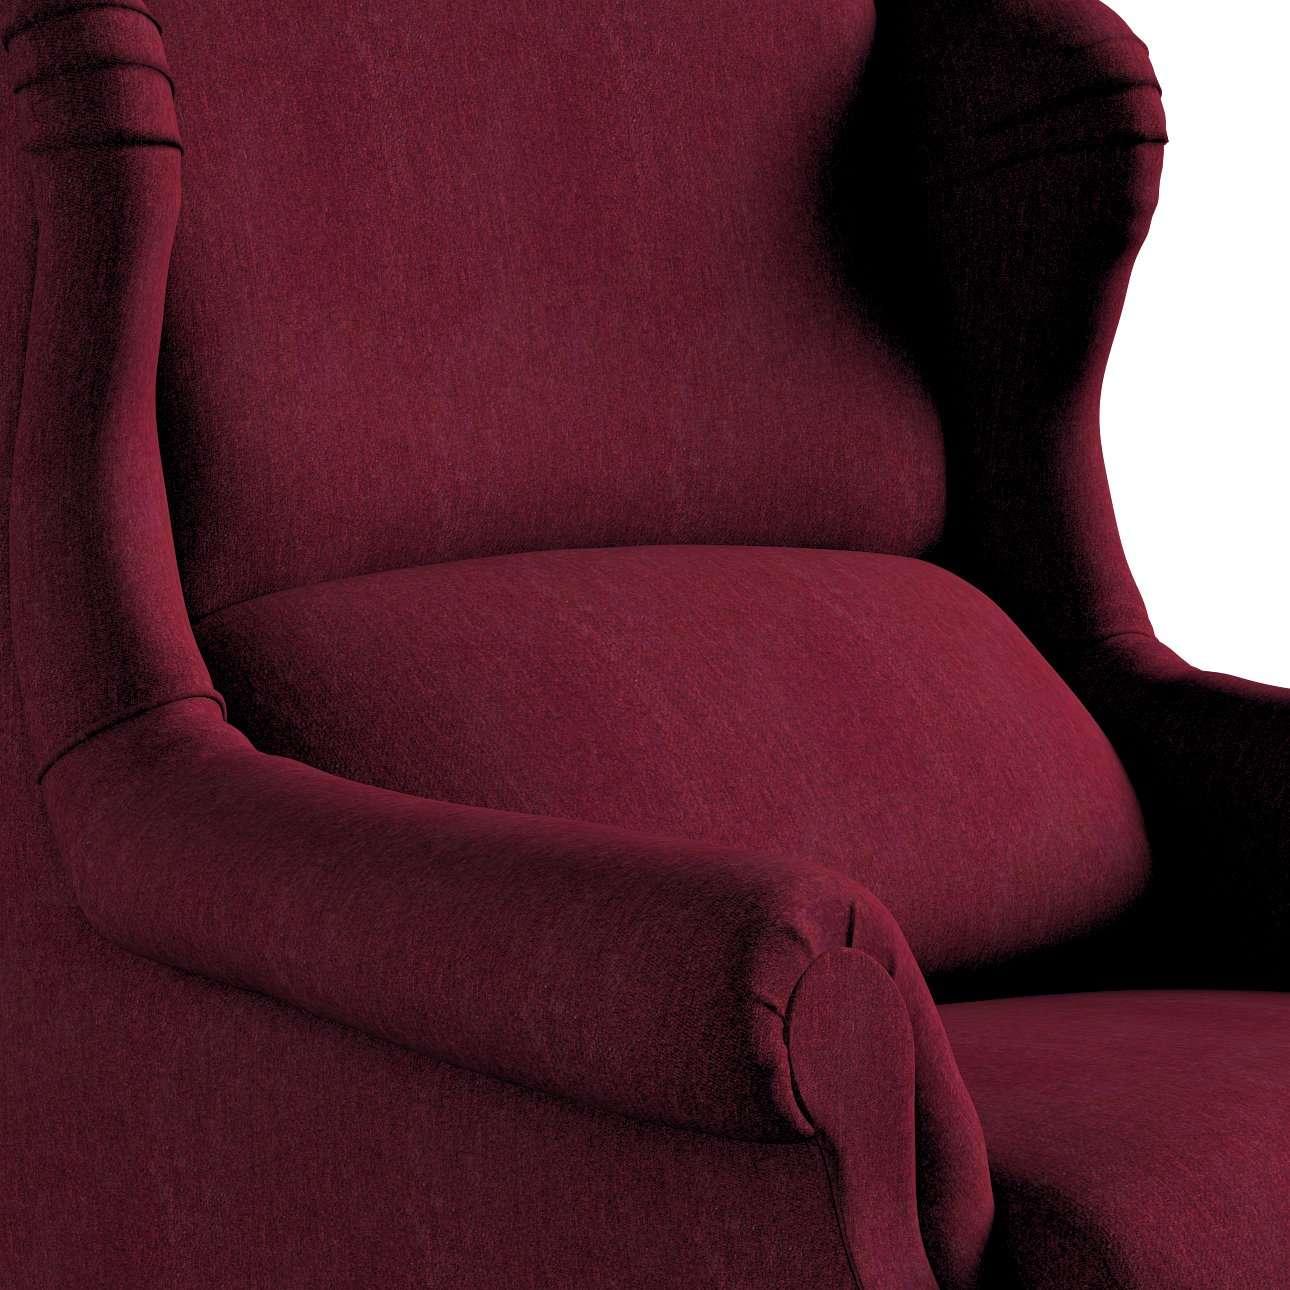 Fotel Unique w kolekcji Chenille, tkanina: 702-19